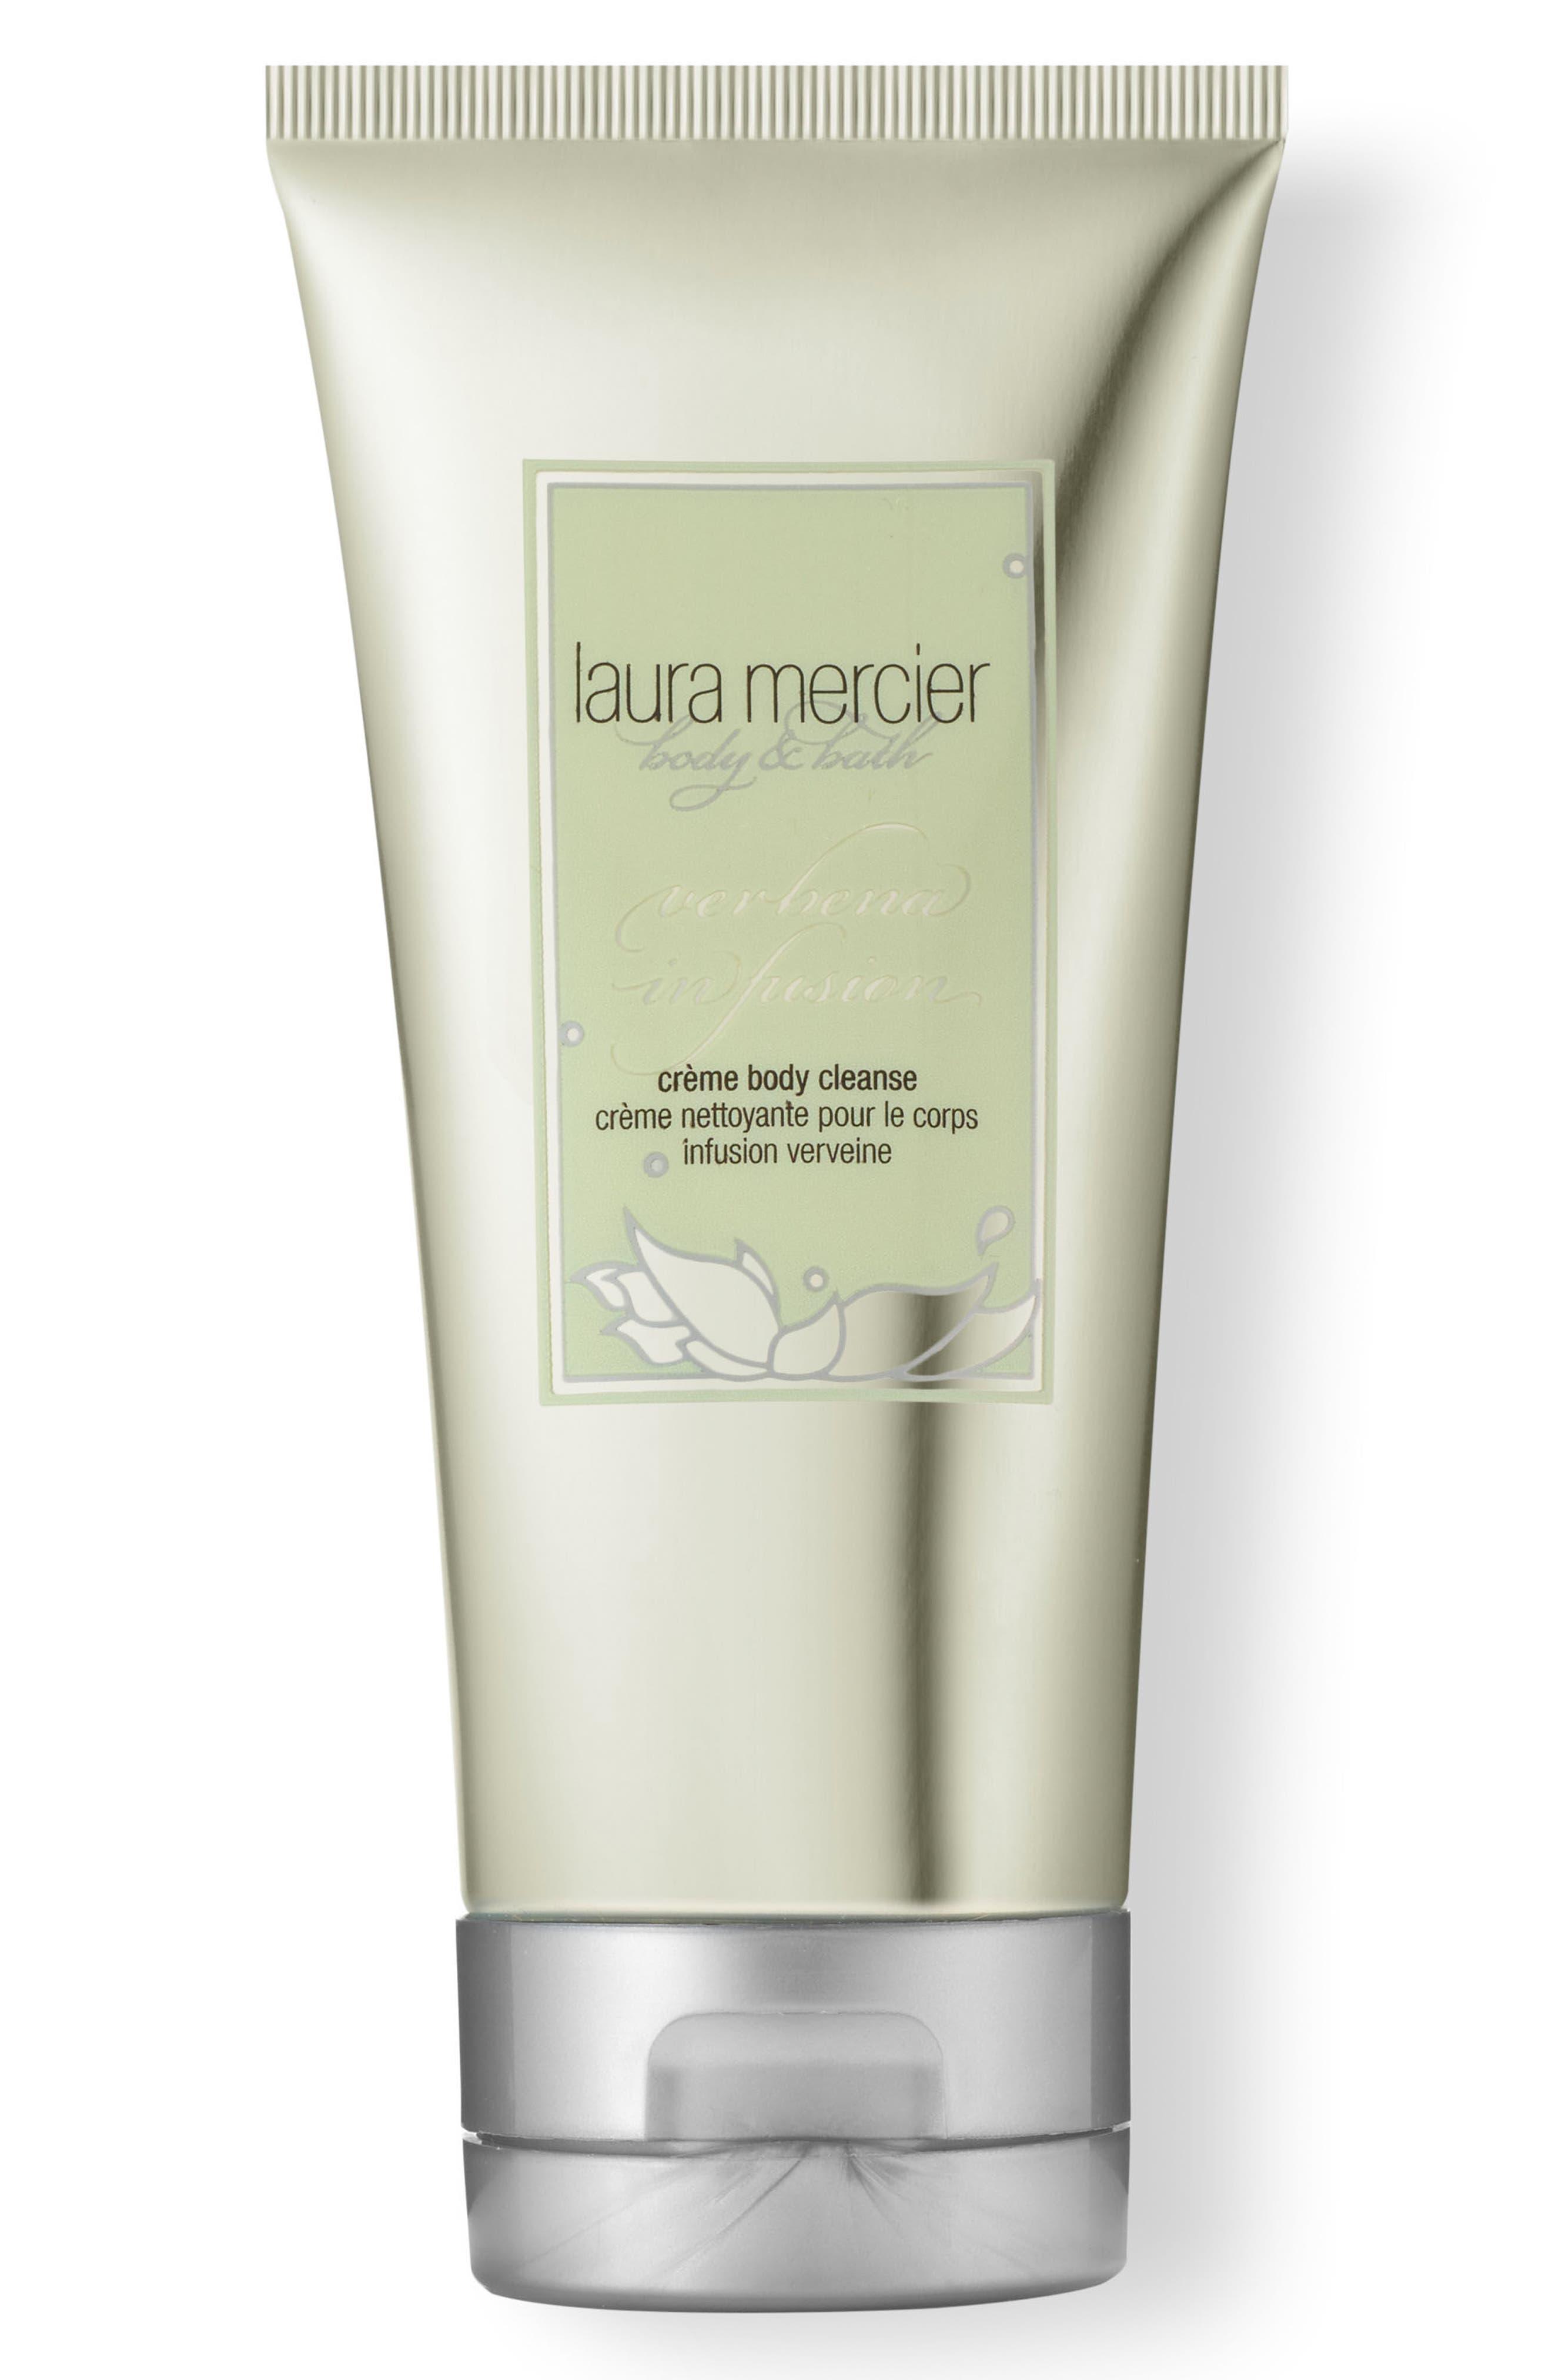 Alternate Image 1 Selected - Laura Mercier 'Verbena Infusion' Creme Body Cleanse